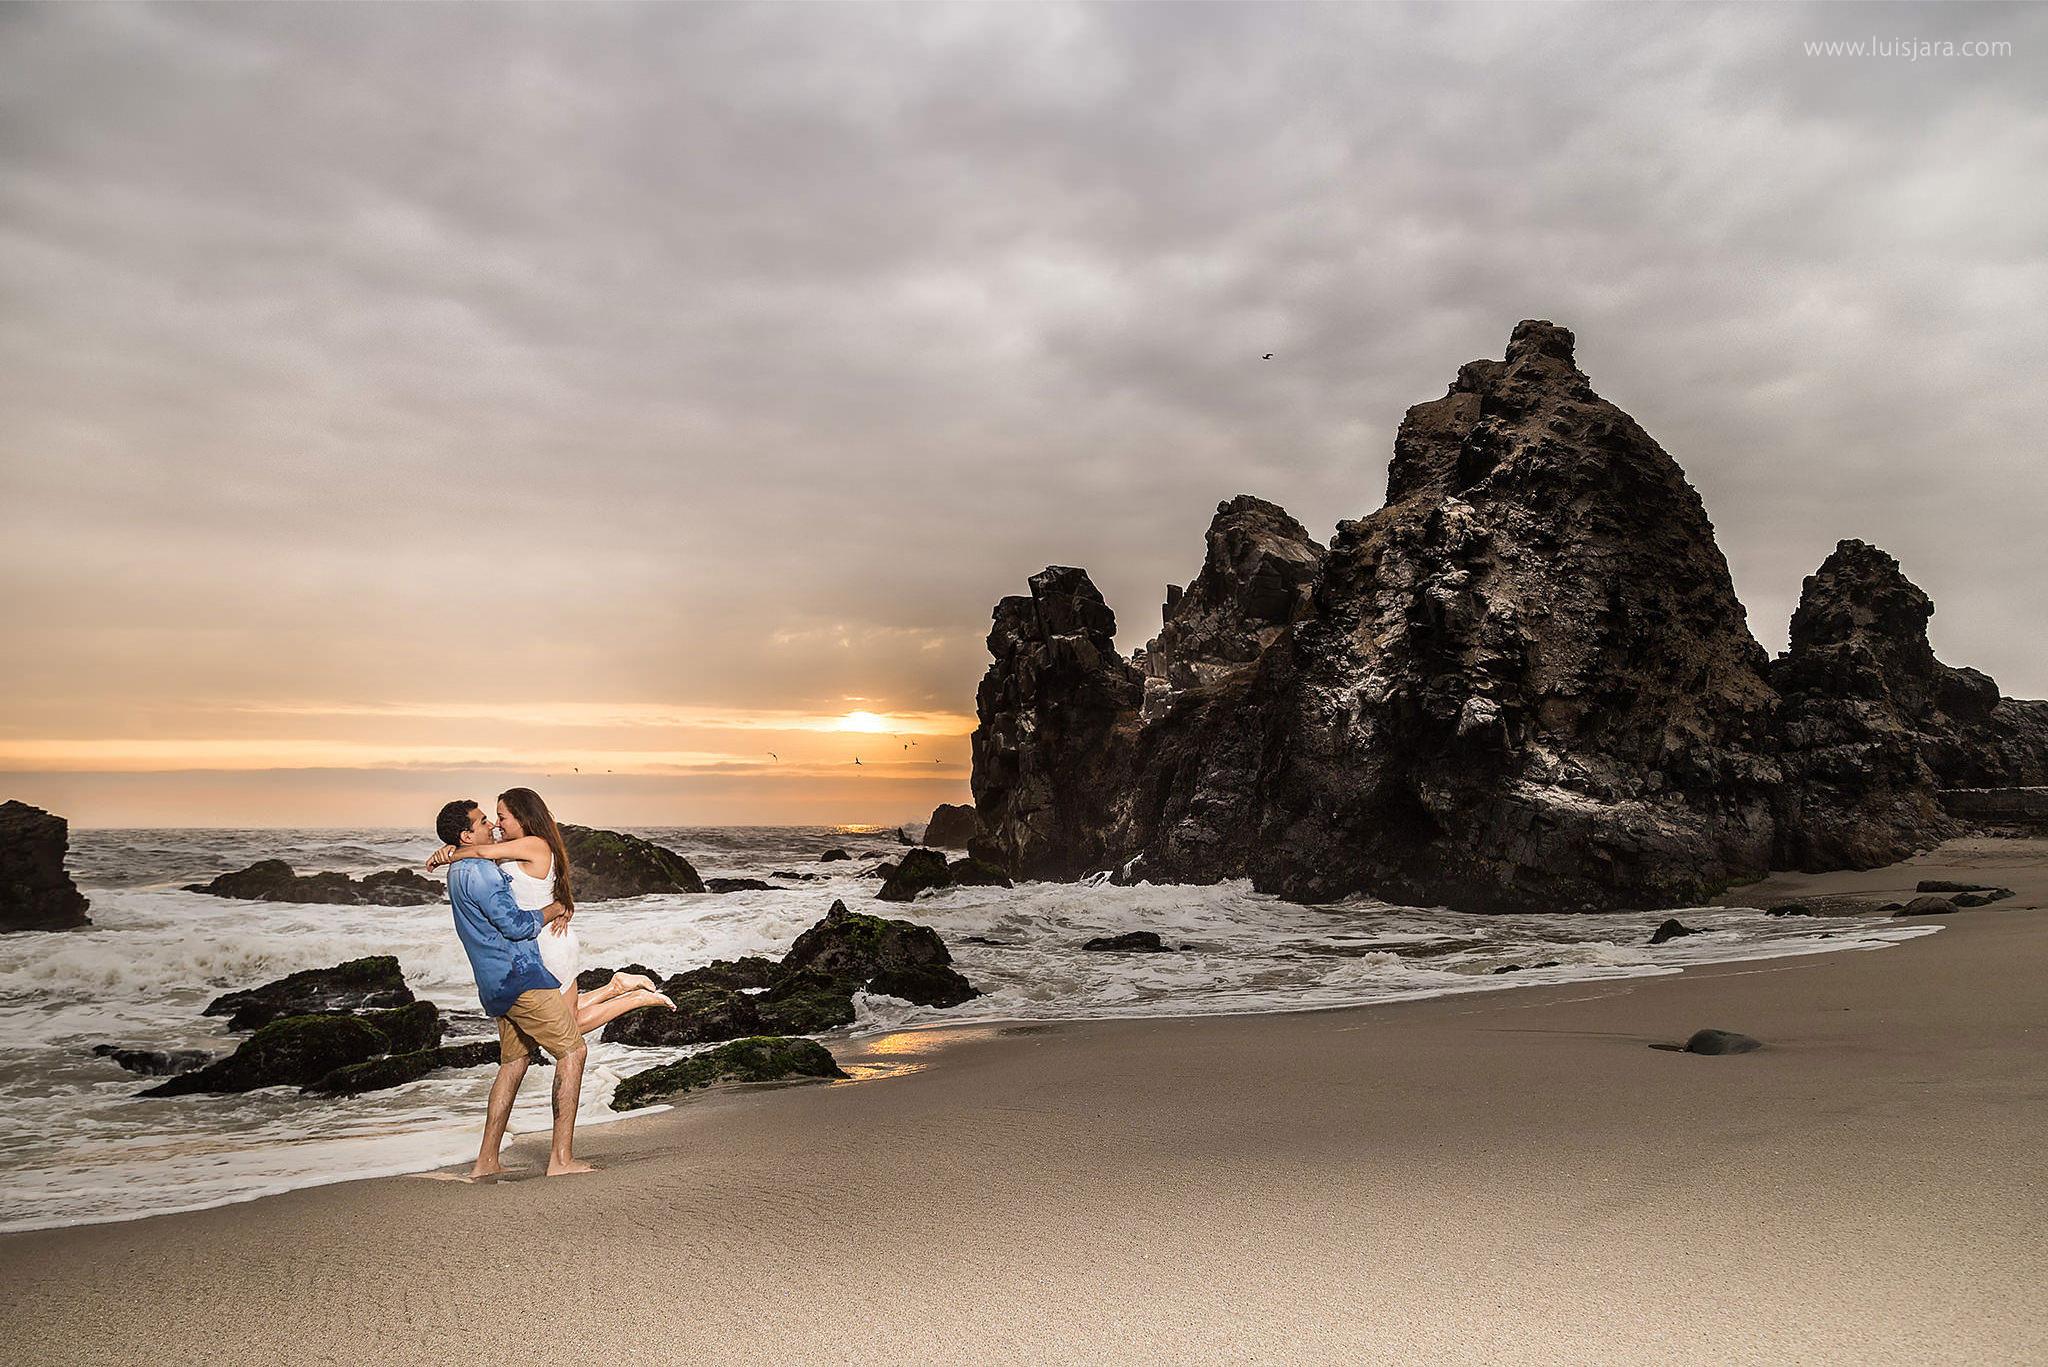 PreBoda en Playa Punta Negra Luis Jara Photography